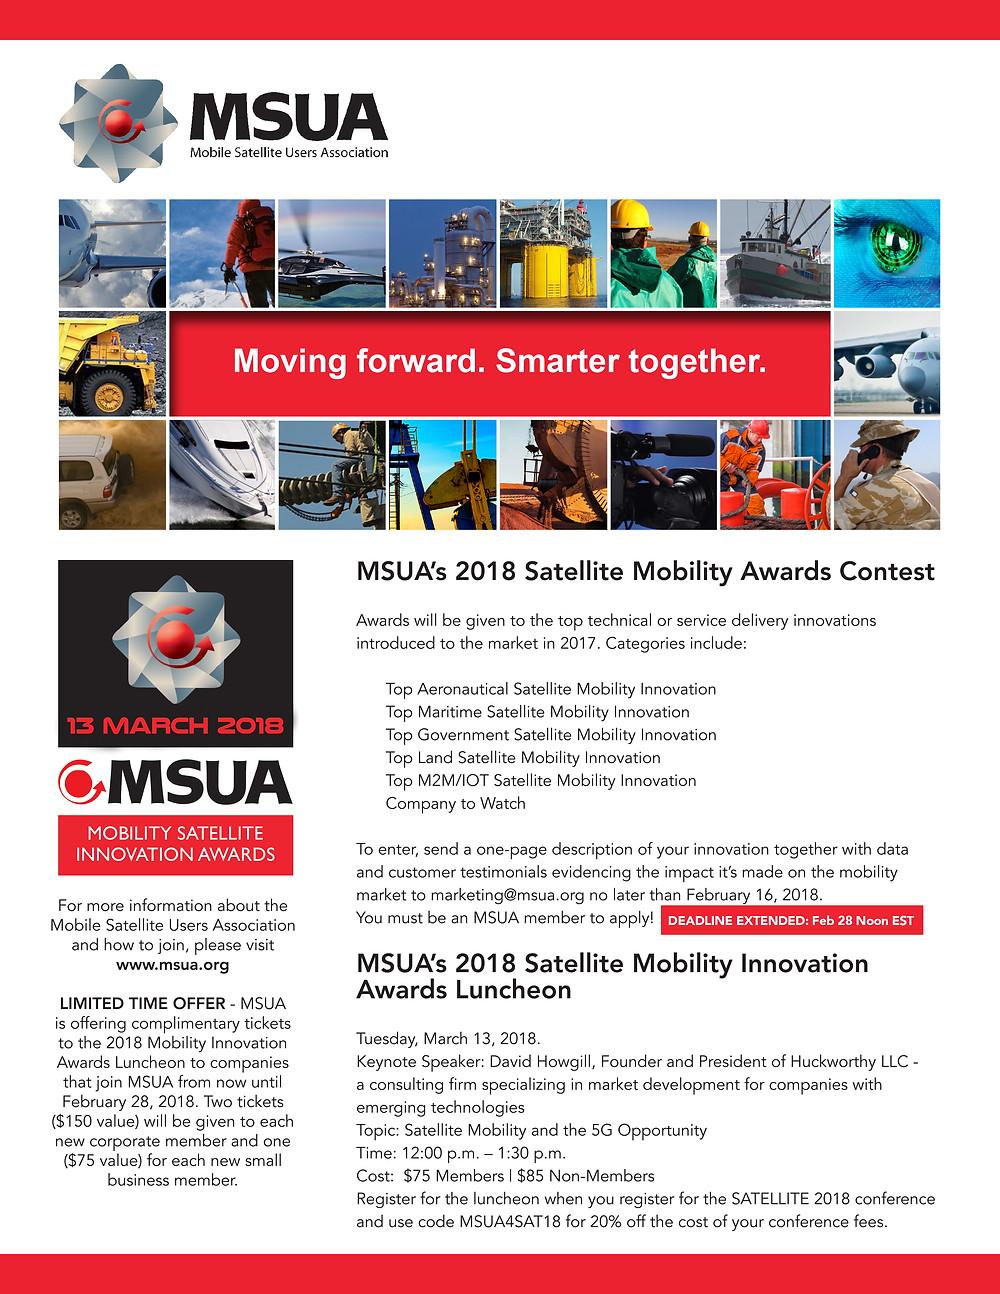 MSUA's 2018 Satellite Mobility Innovation Awards